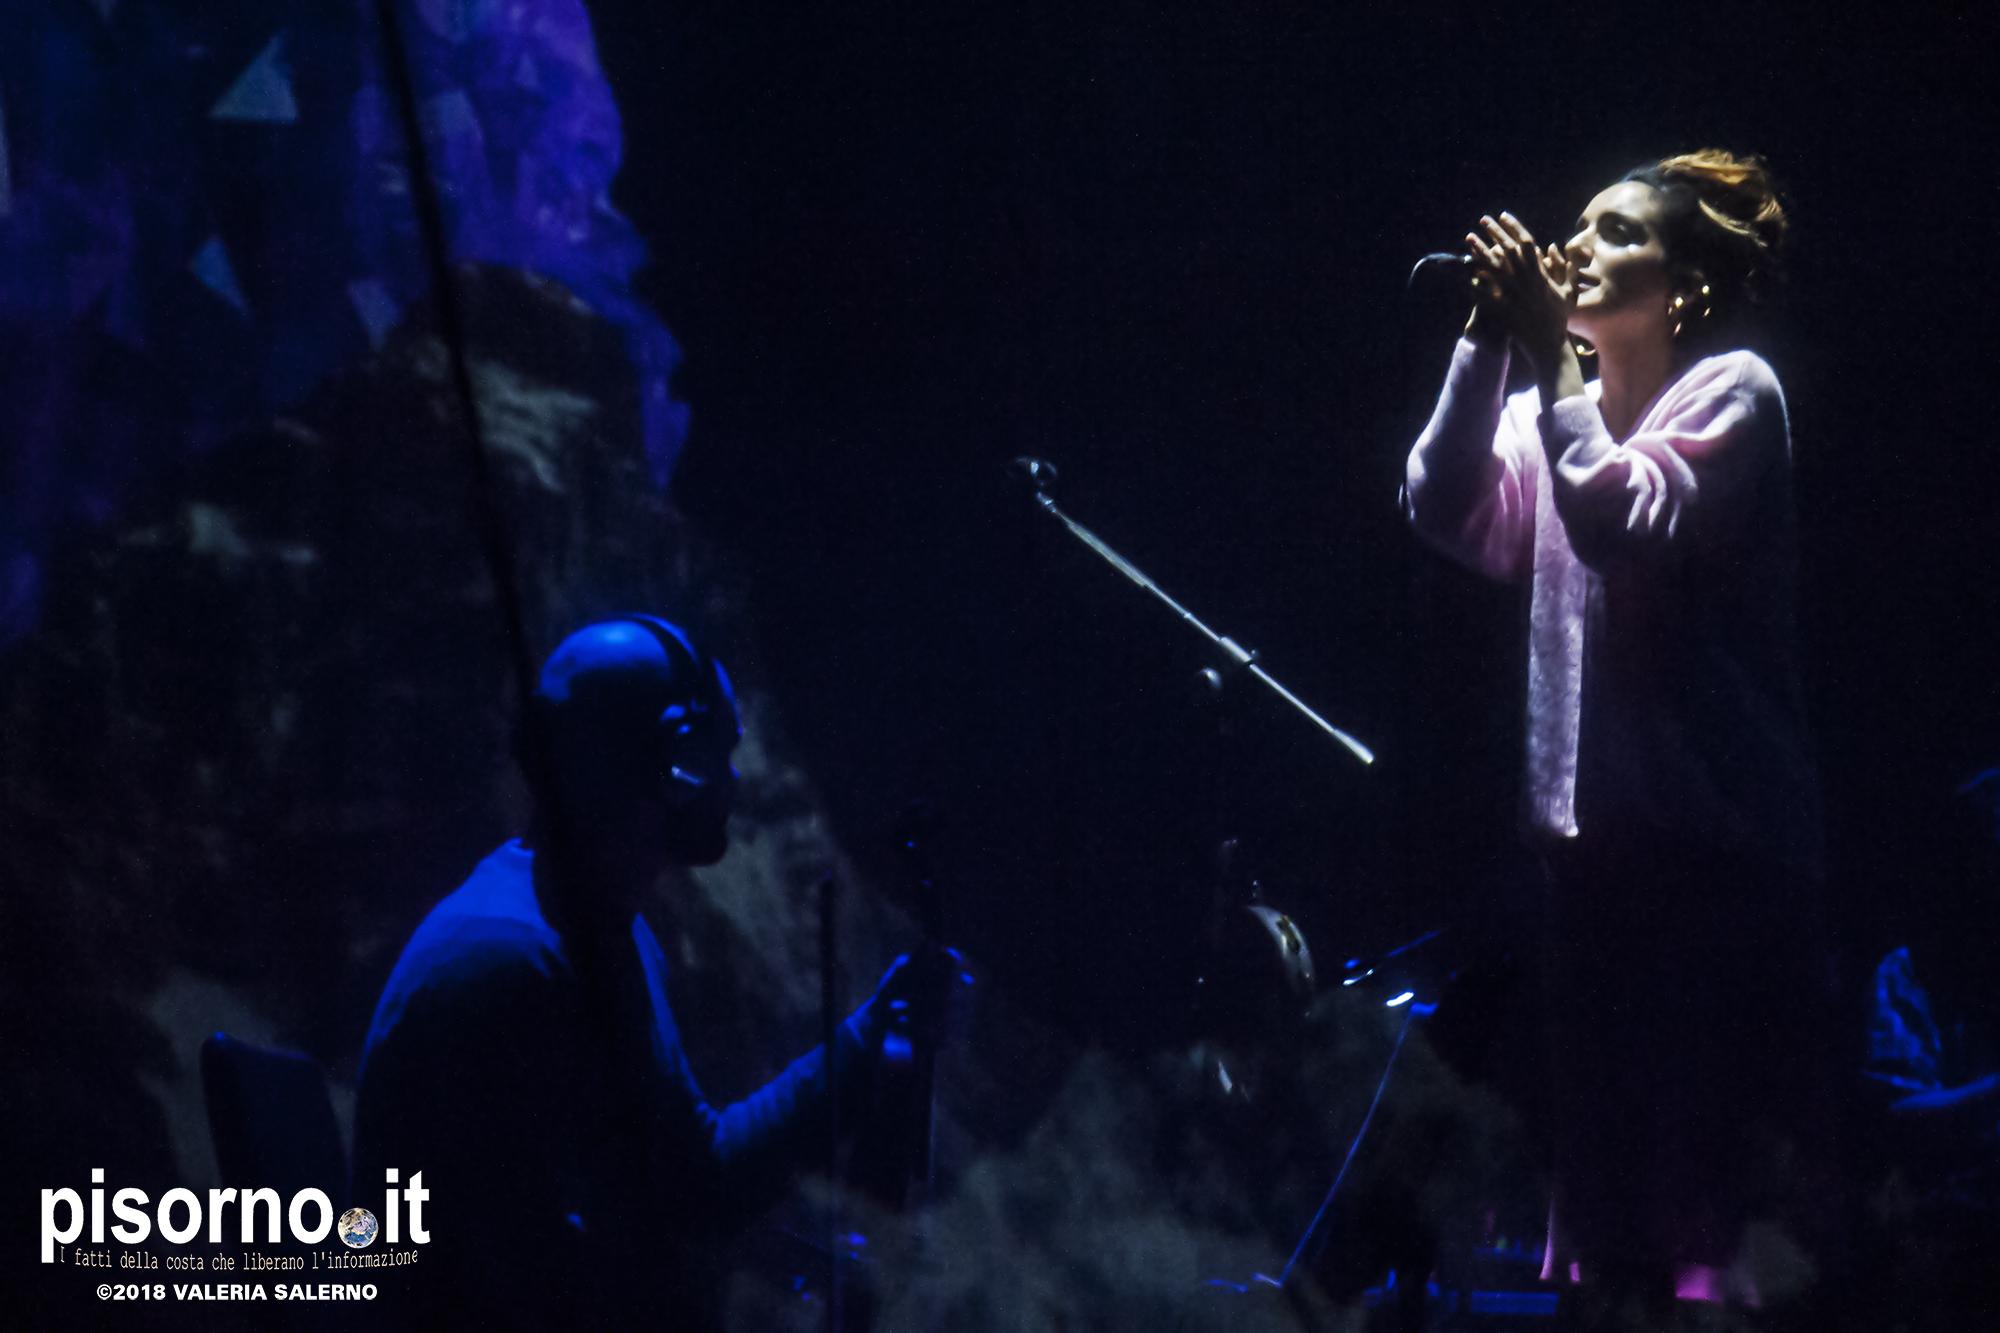 Levante @ Teatro Verdi (Firenze, Italy), 26 Febbraio 2018